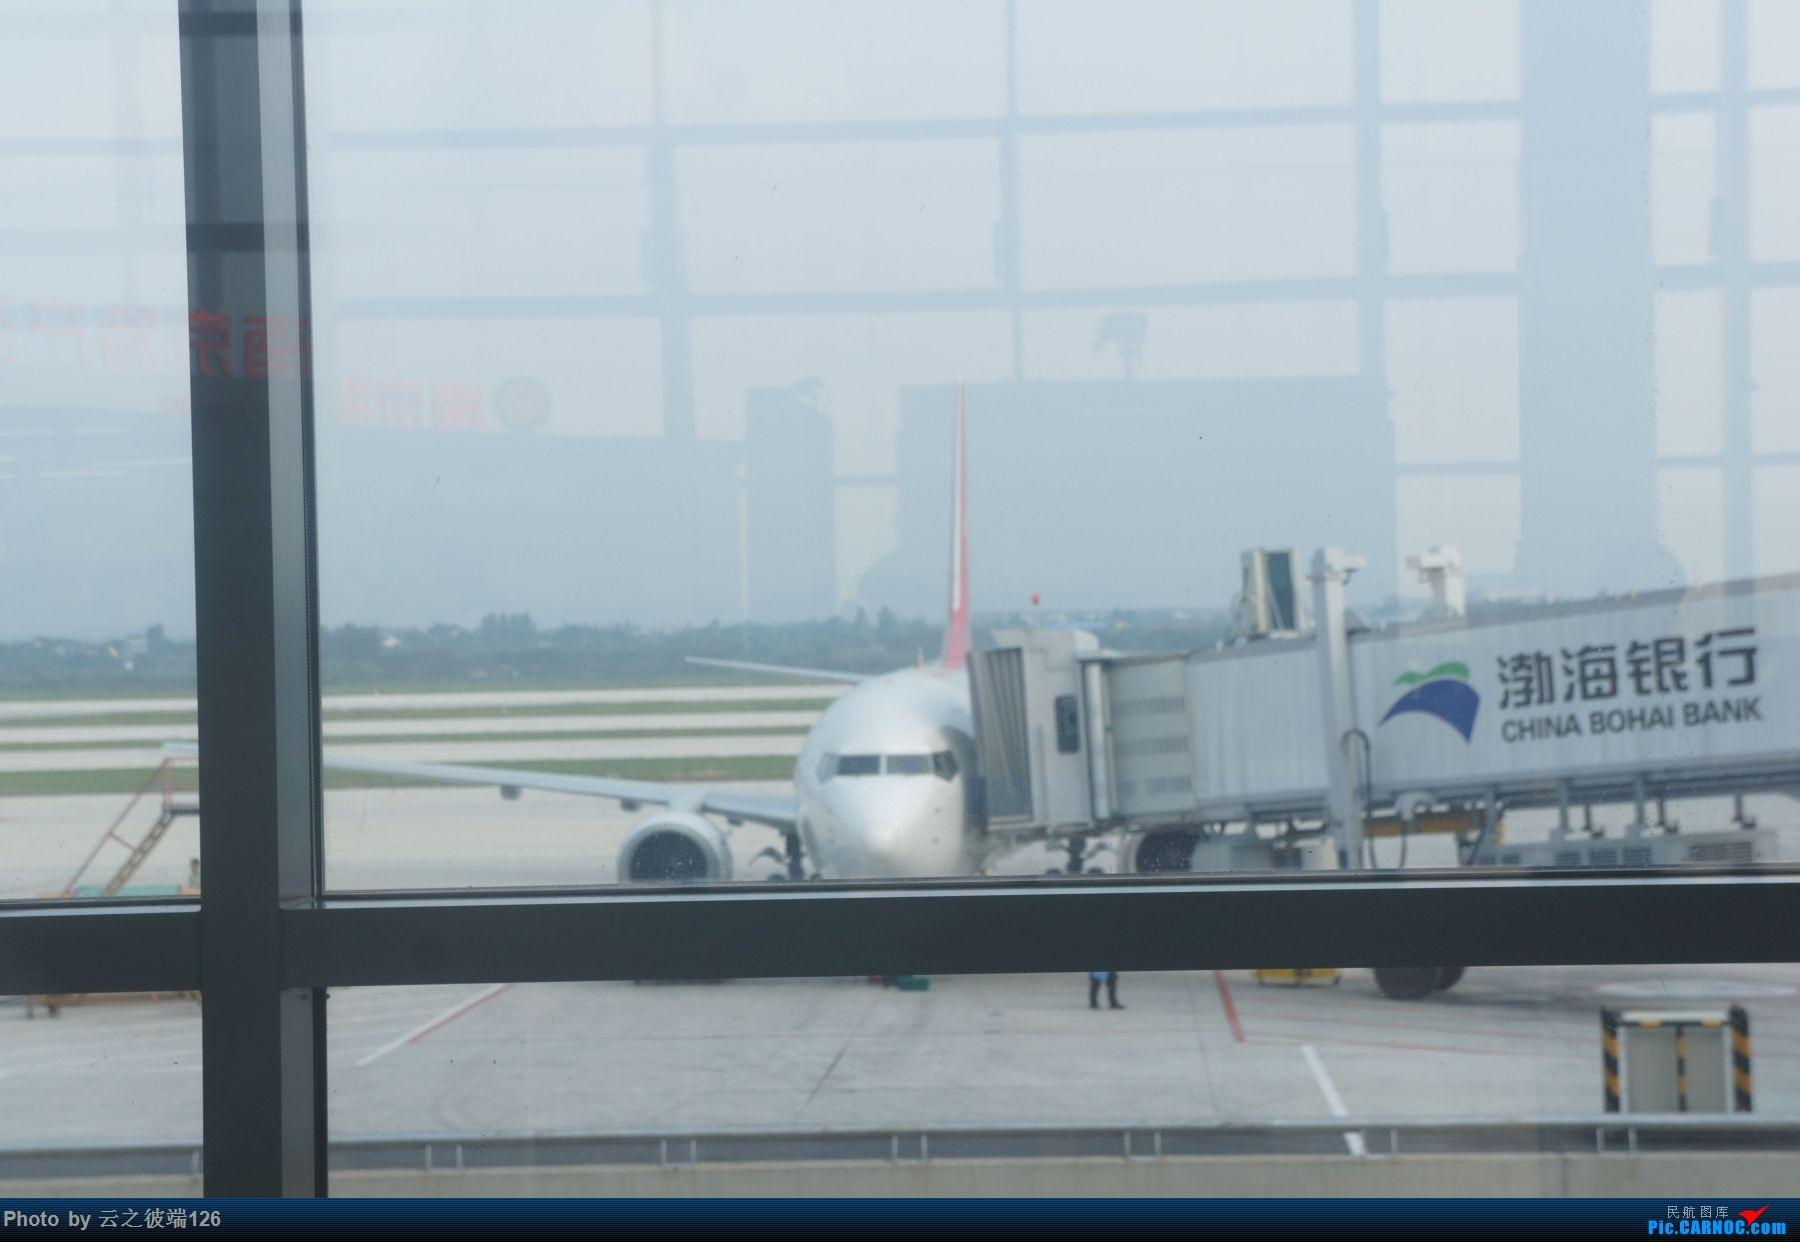 Re:[原创]迟到两年的游记 -----------NKG-SZX-NKG ZH+白菜航------ BOEING 737-800 B-5186 中国南京禄口国际机场